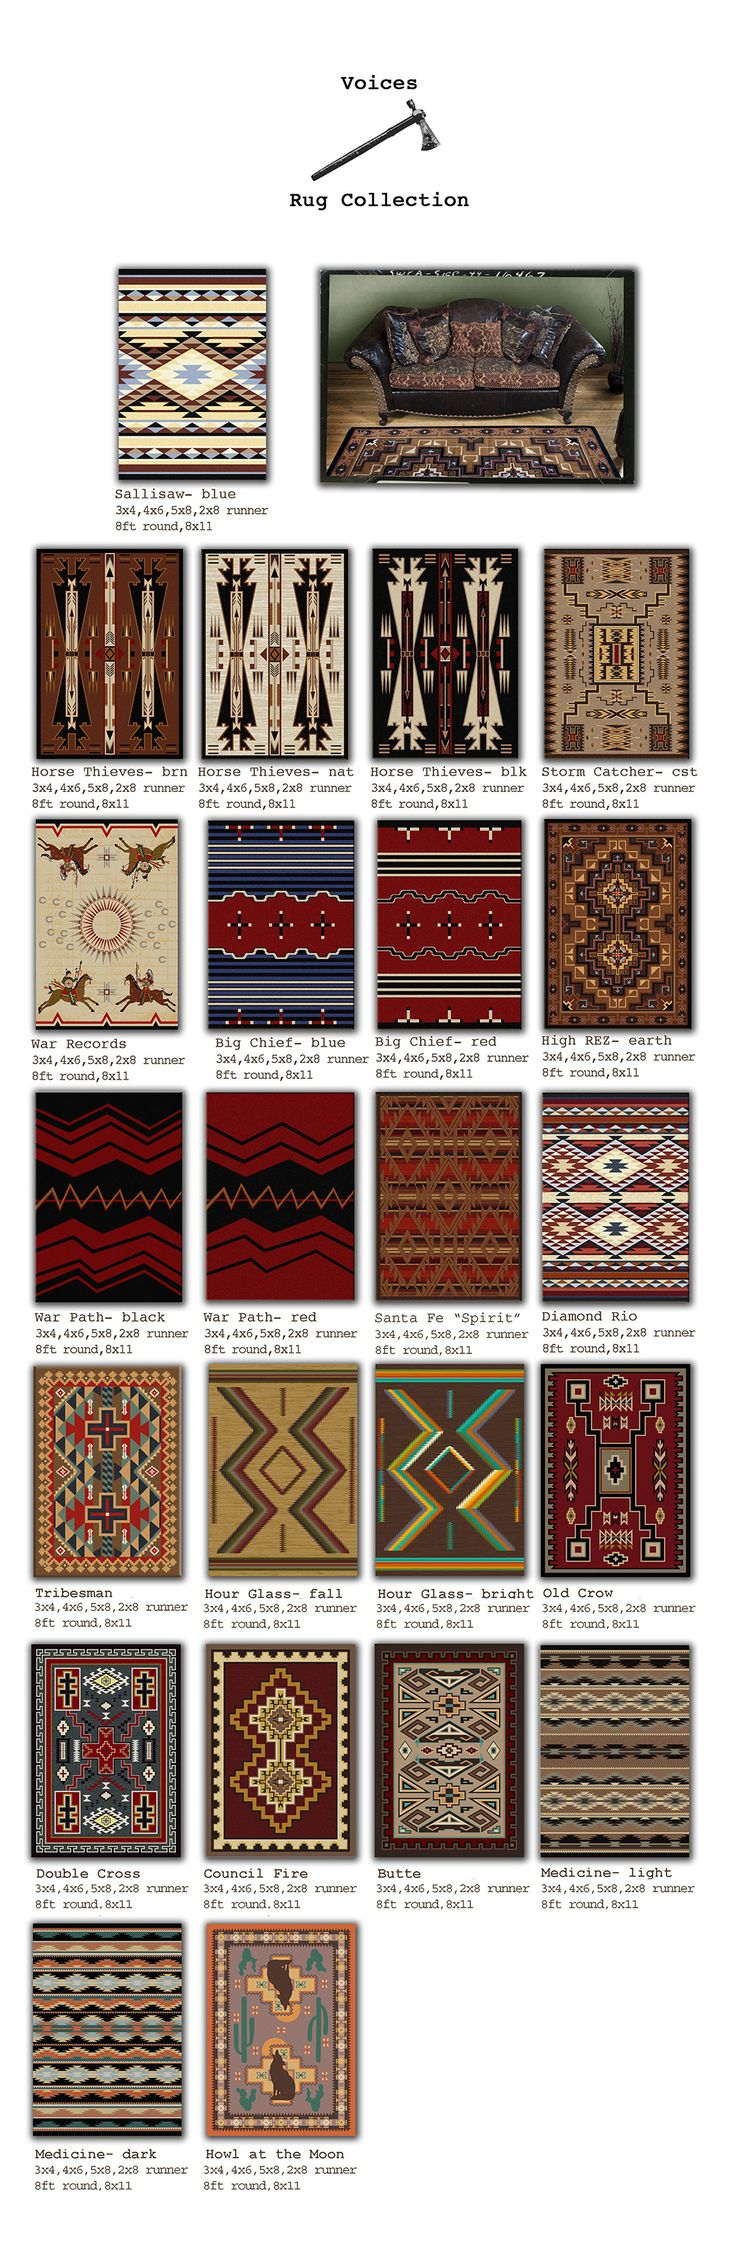 Americandakota - site for beautiful rugs